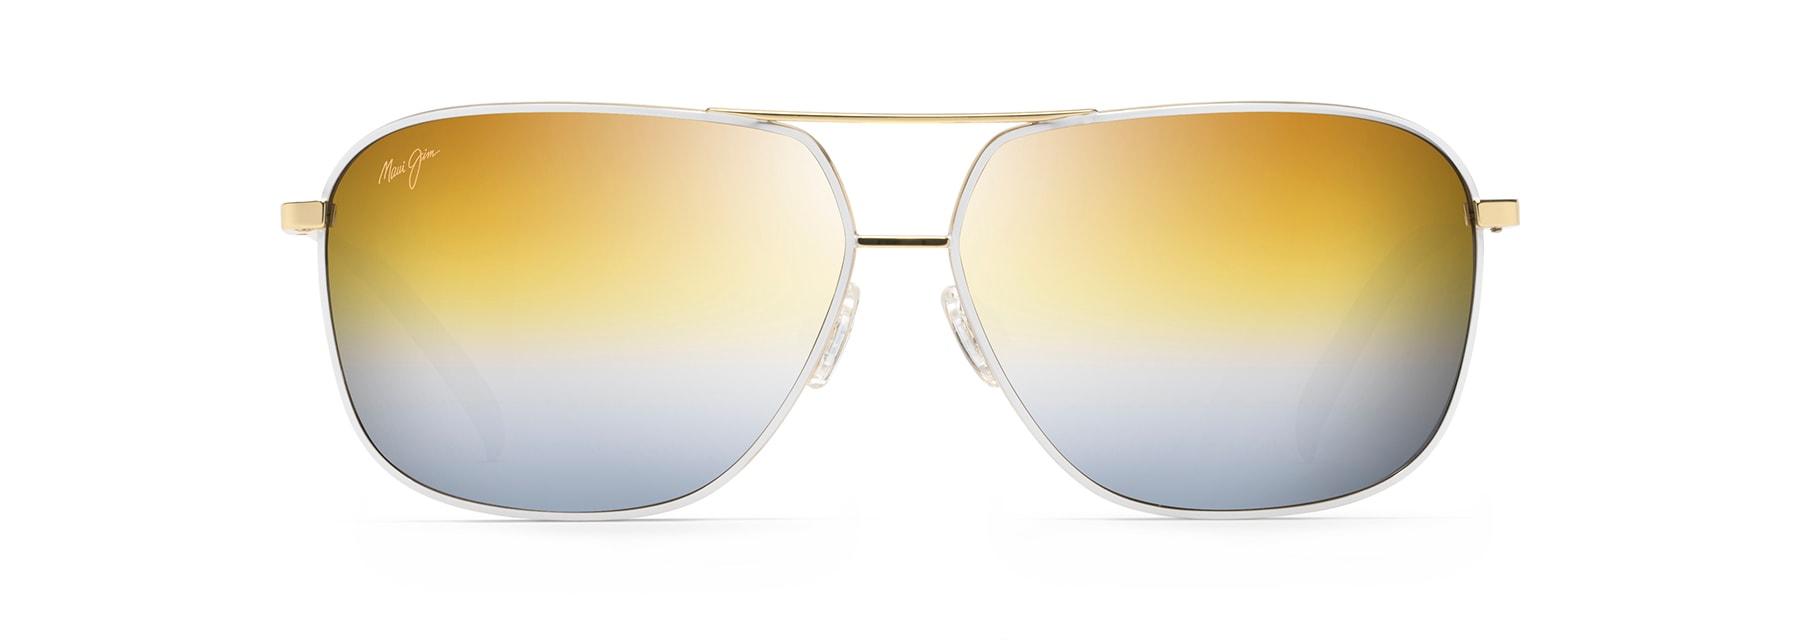 HS774-16 with Patented PolarizedPlus2 Lens Technology HCL Bronze Lenses Maui Jim Sunglasses Maui Jim Cook Pines Polarized Silver Aviator Frame Sunglasses Maui Jim